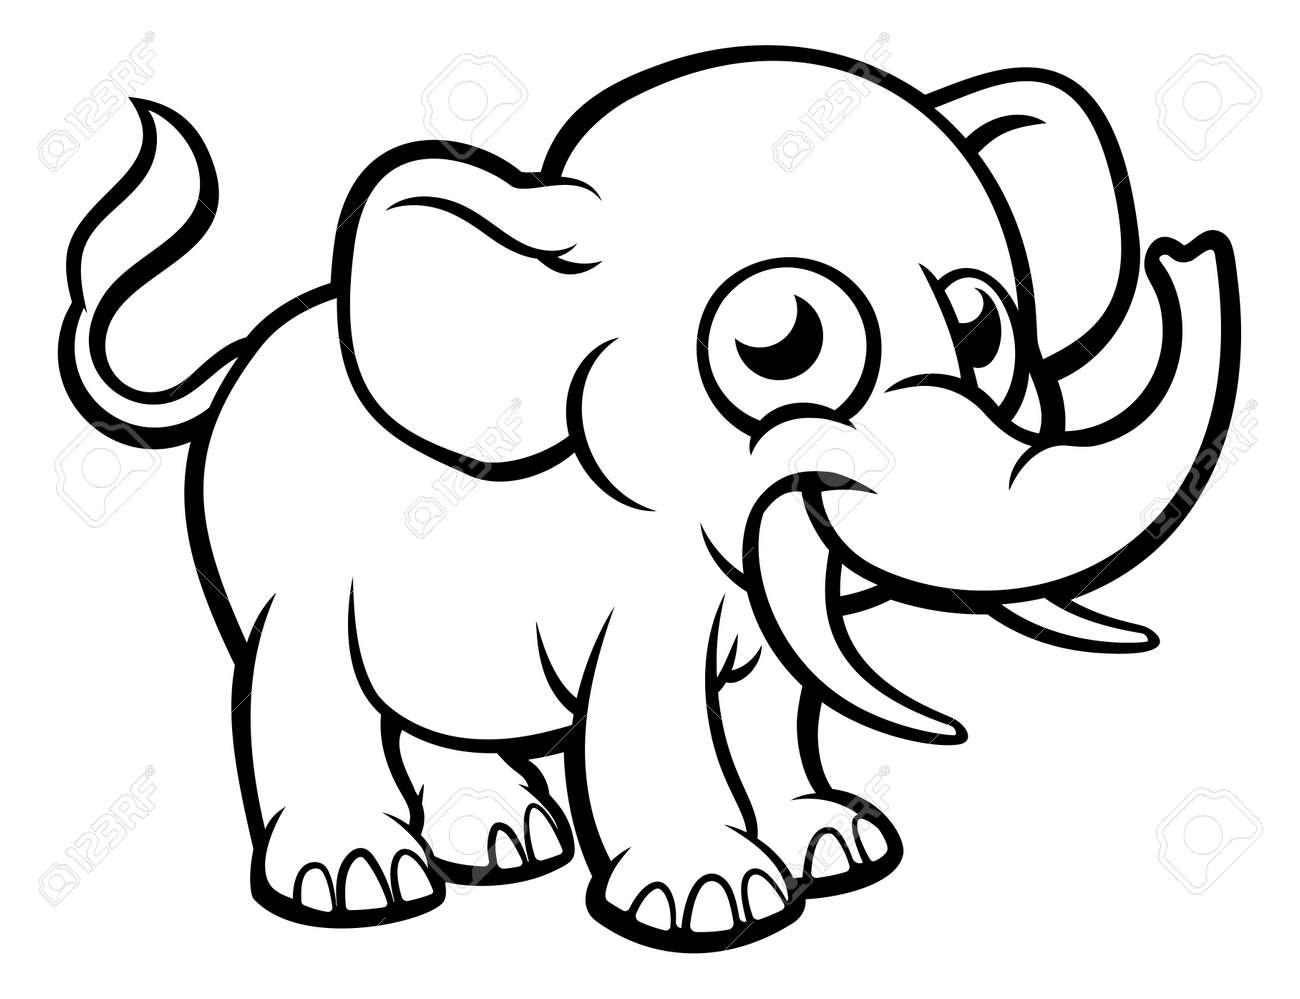 Un Elephant Animaux De Safari Dessin Anime Personnage De Dessin A